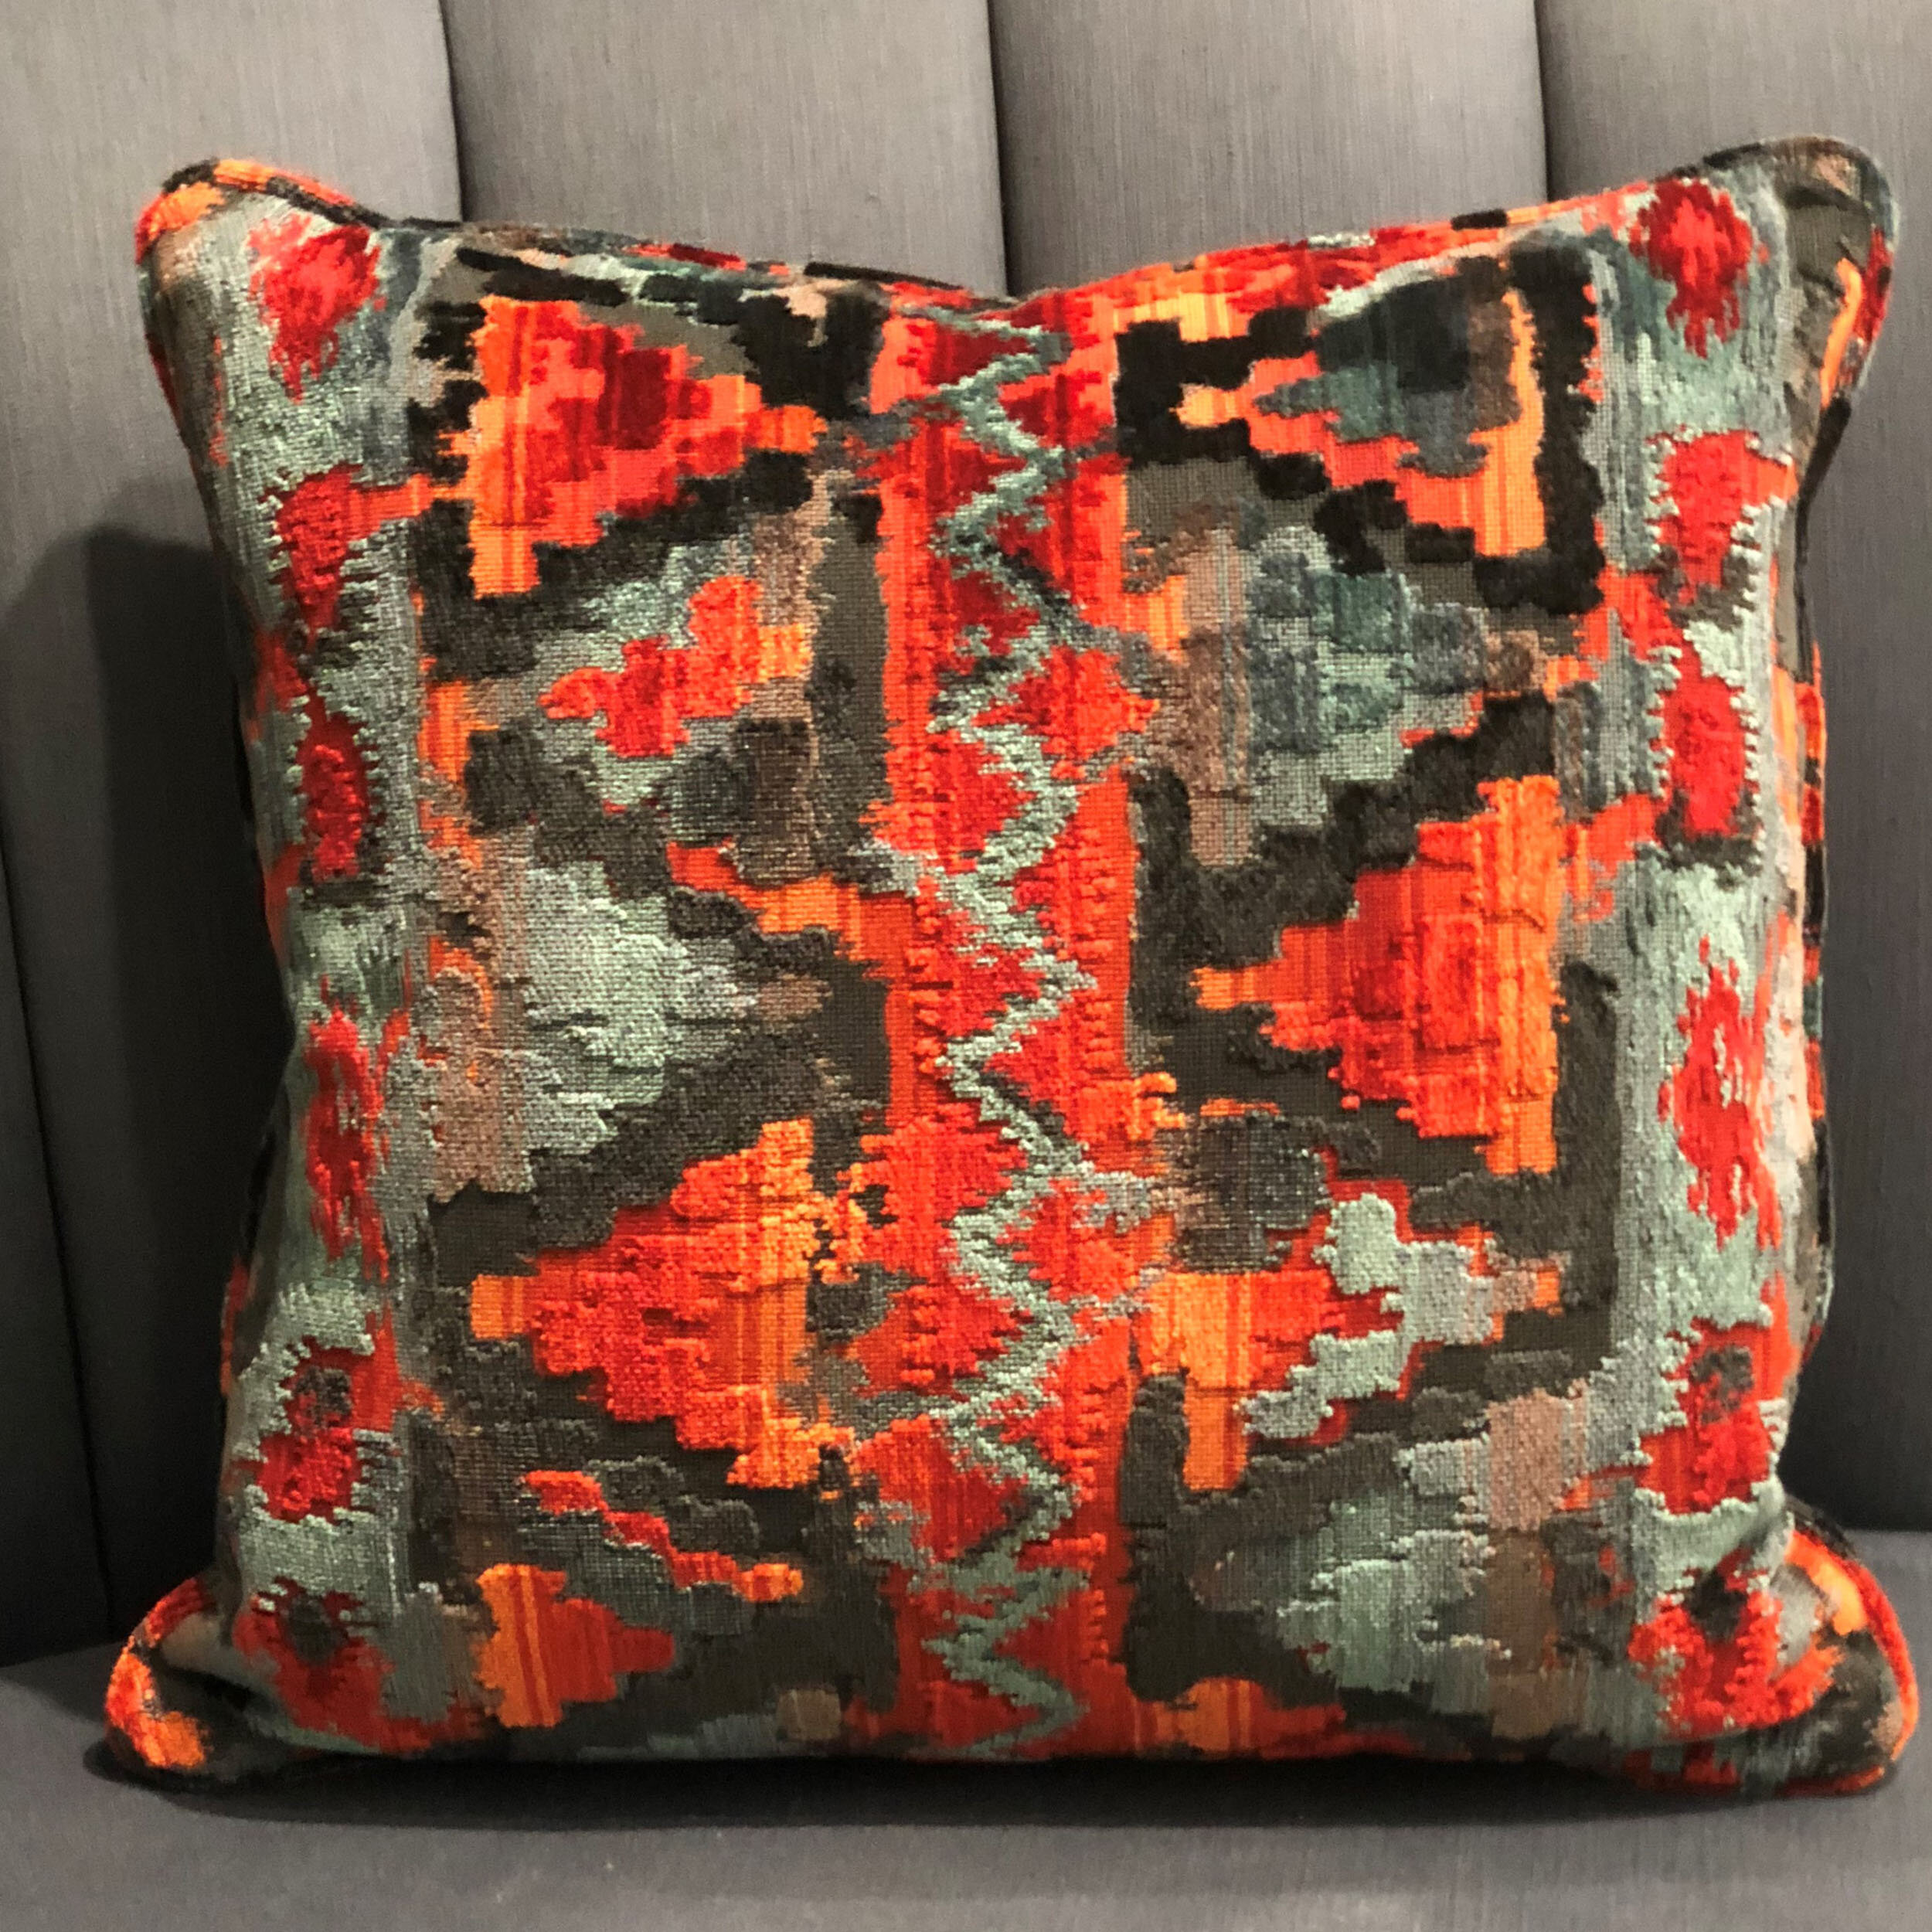 Euro Synthetic Throw Pillows You Ll Love In 2021 Wayfair